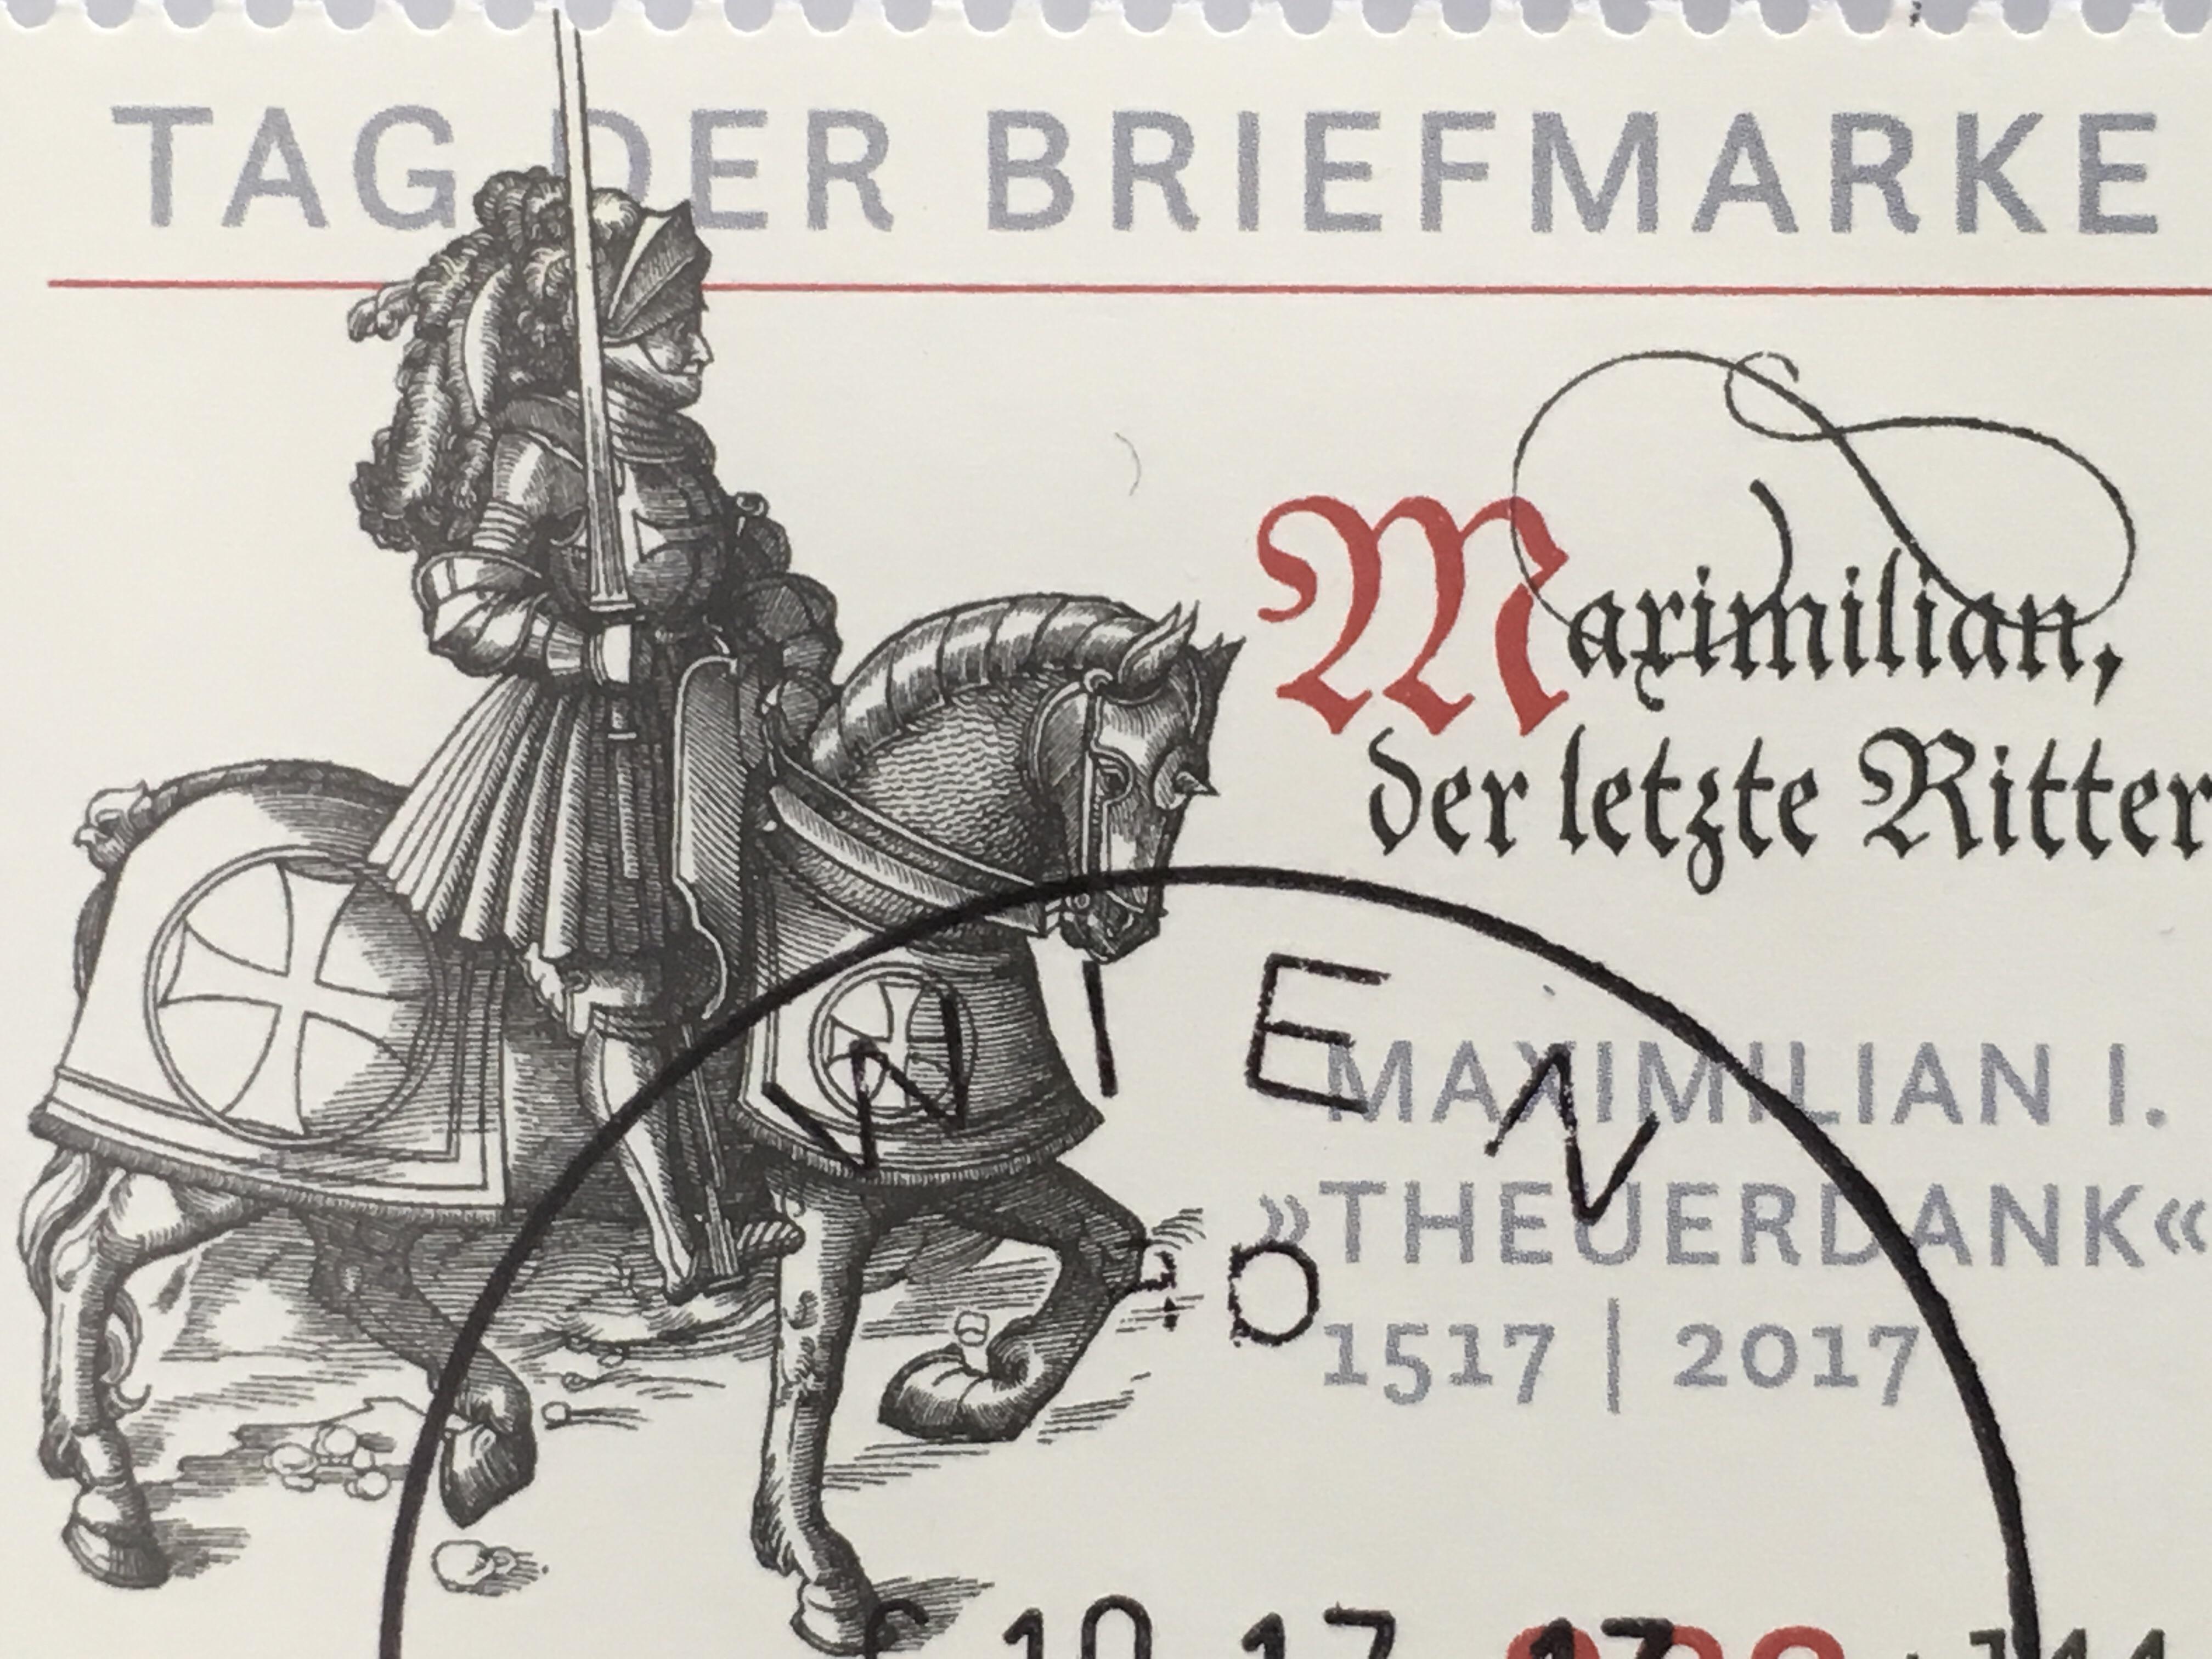 Maximilian Der Letzte Ritter